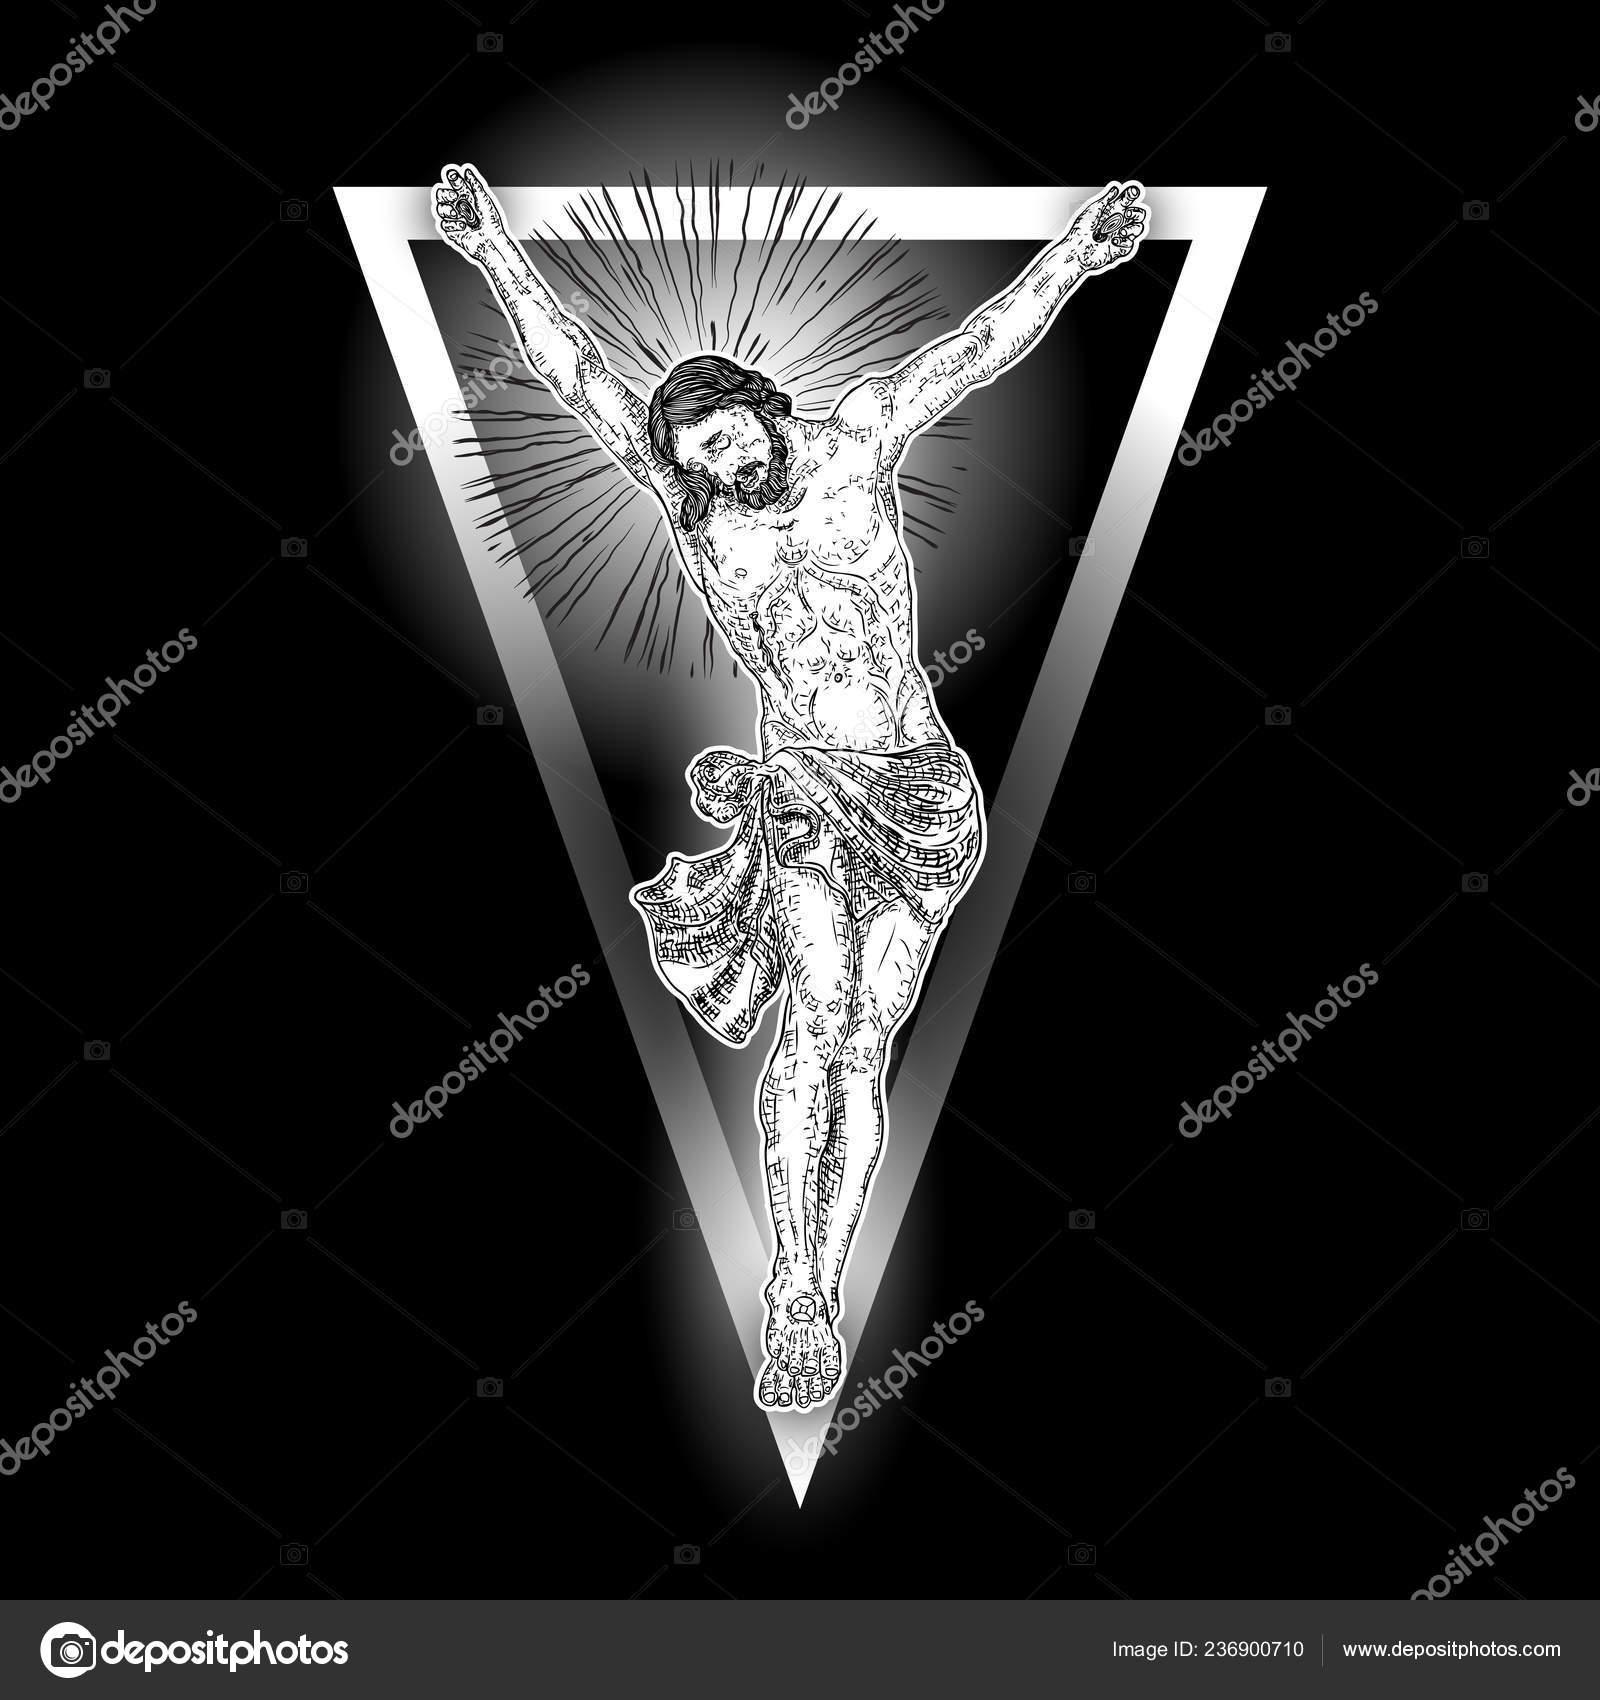 Jezus Christus Met Aanwijseffect Driehoek Tatoeage New Age